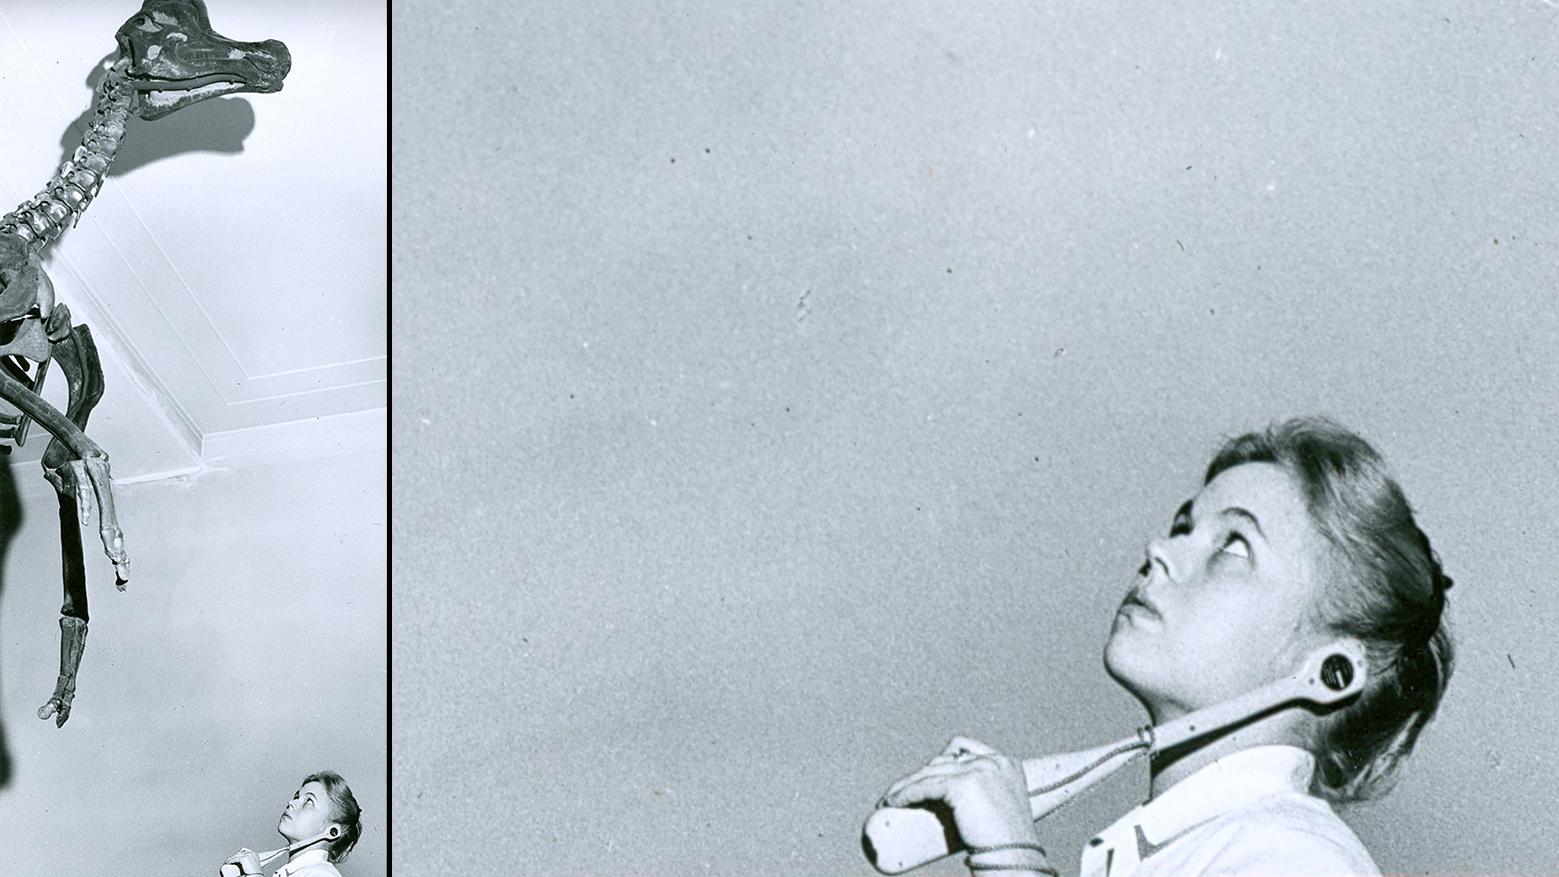 girl listening to handheld radio device in gallery